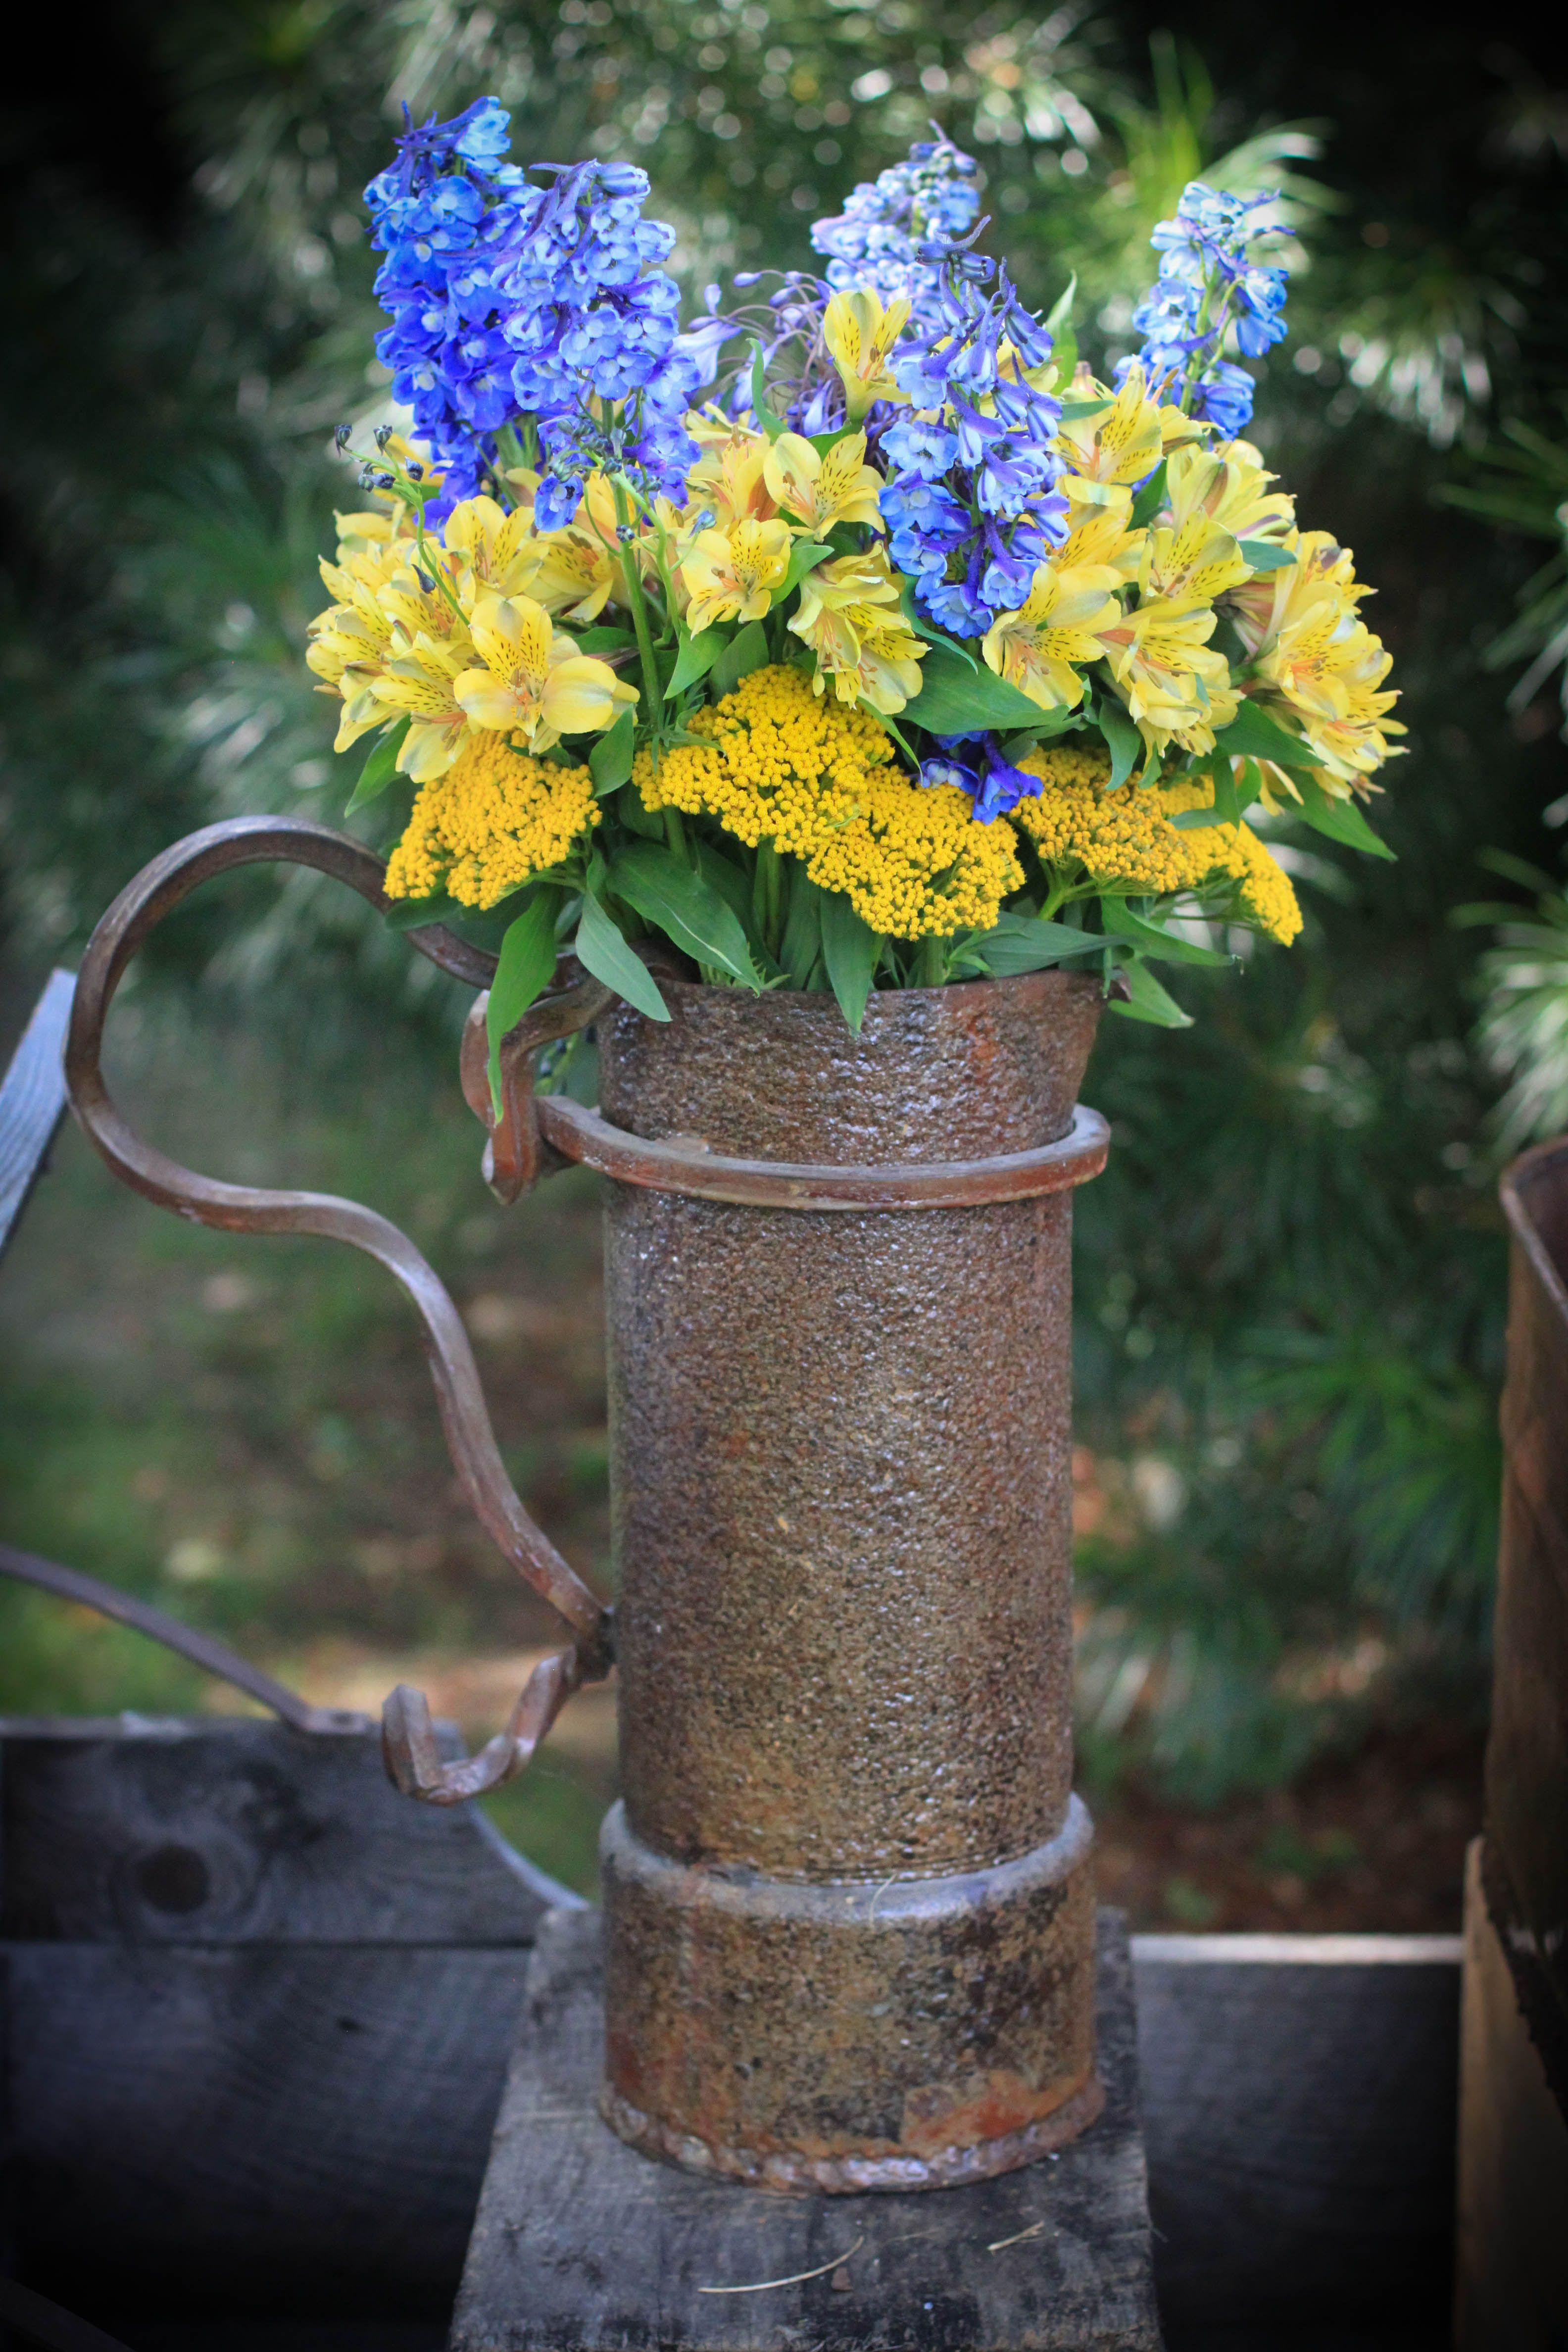 Yellow + blue flowers #wedding